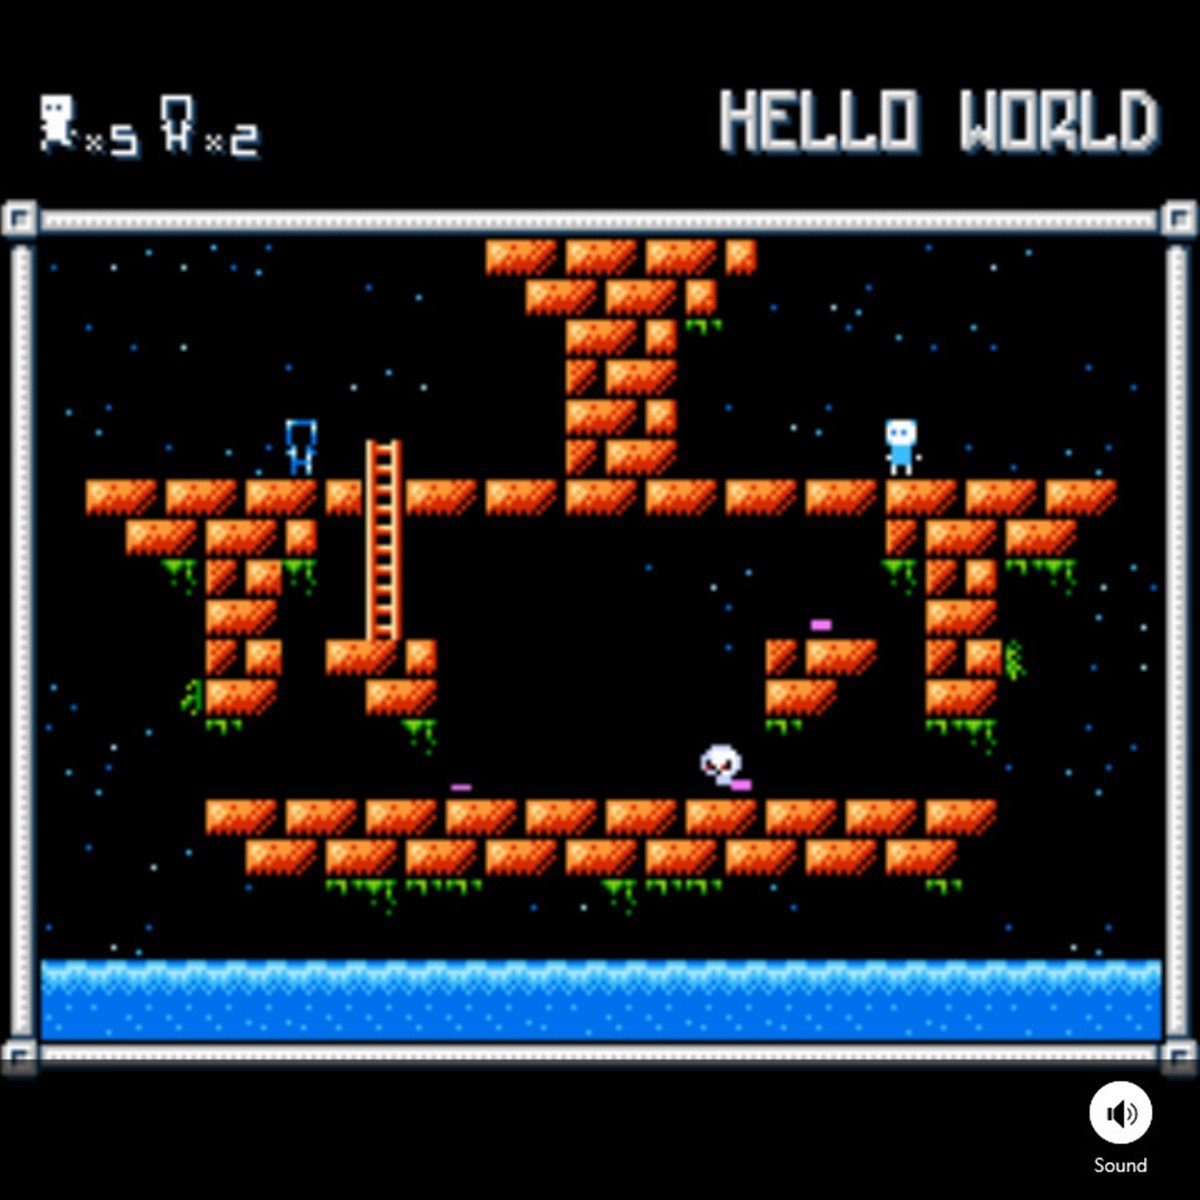 NESBox Alternatives and Similar Games - AlternativeTo net